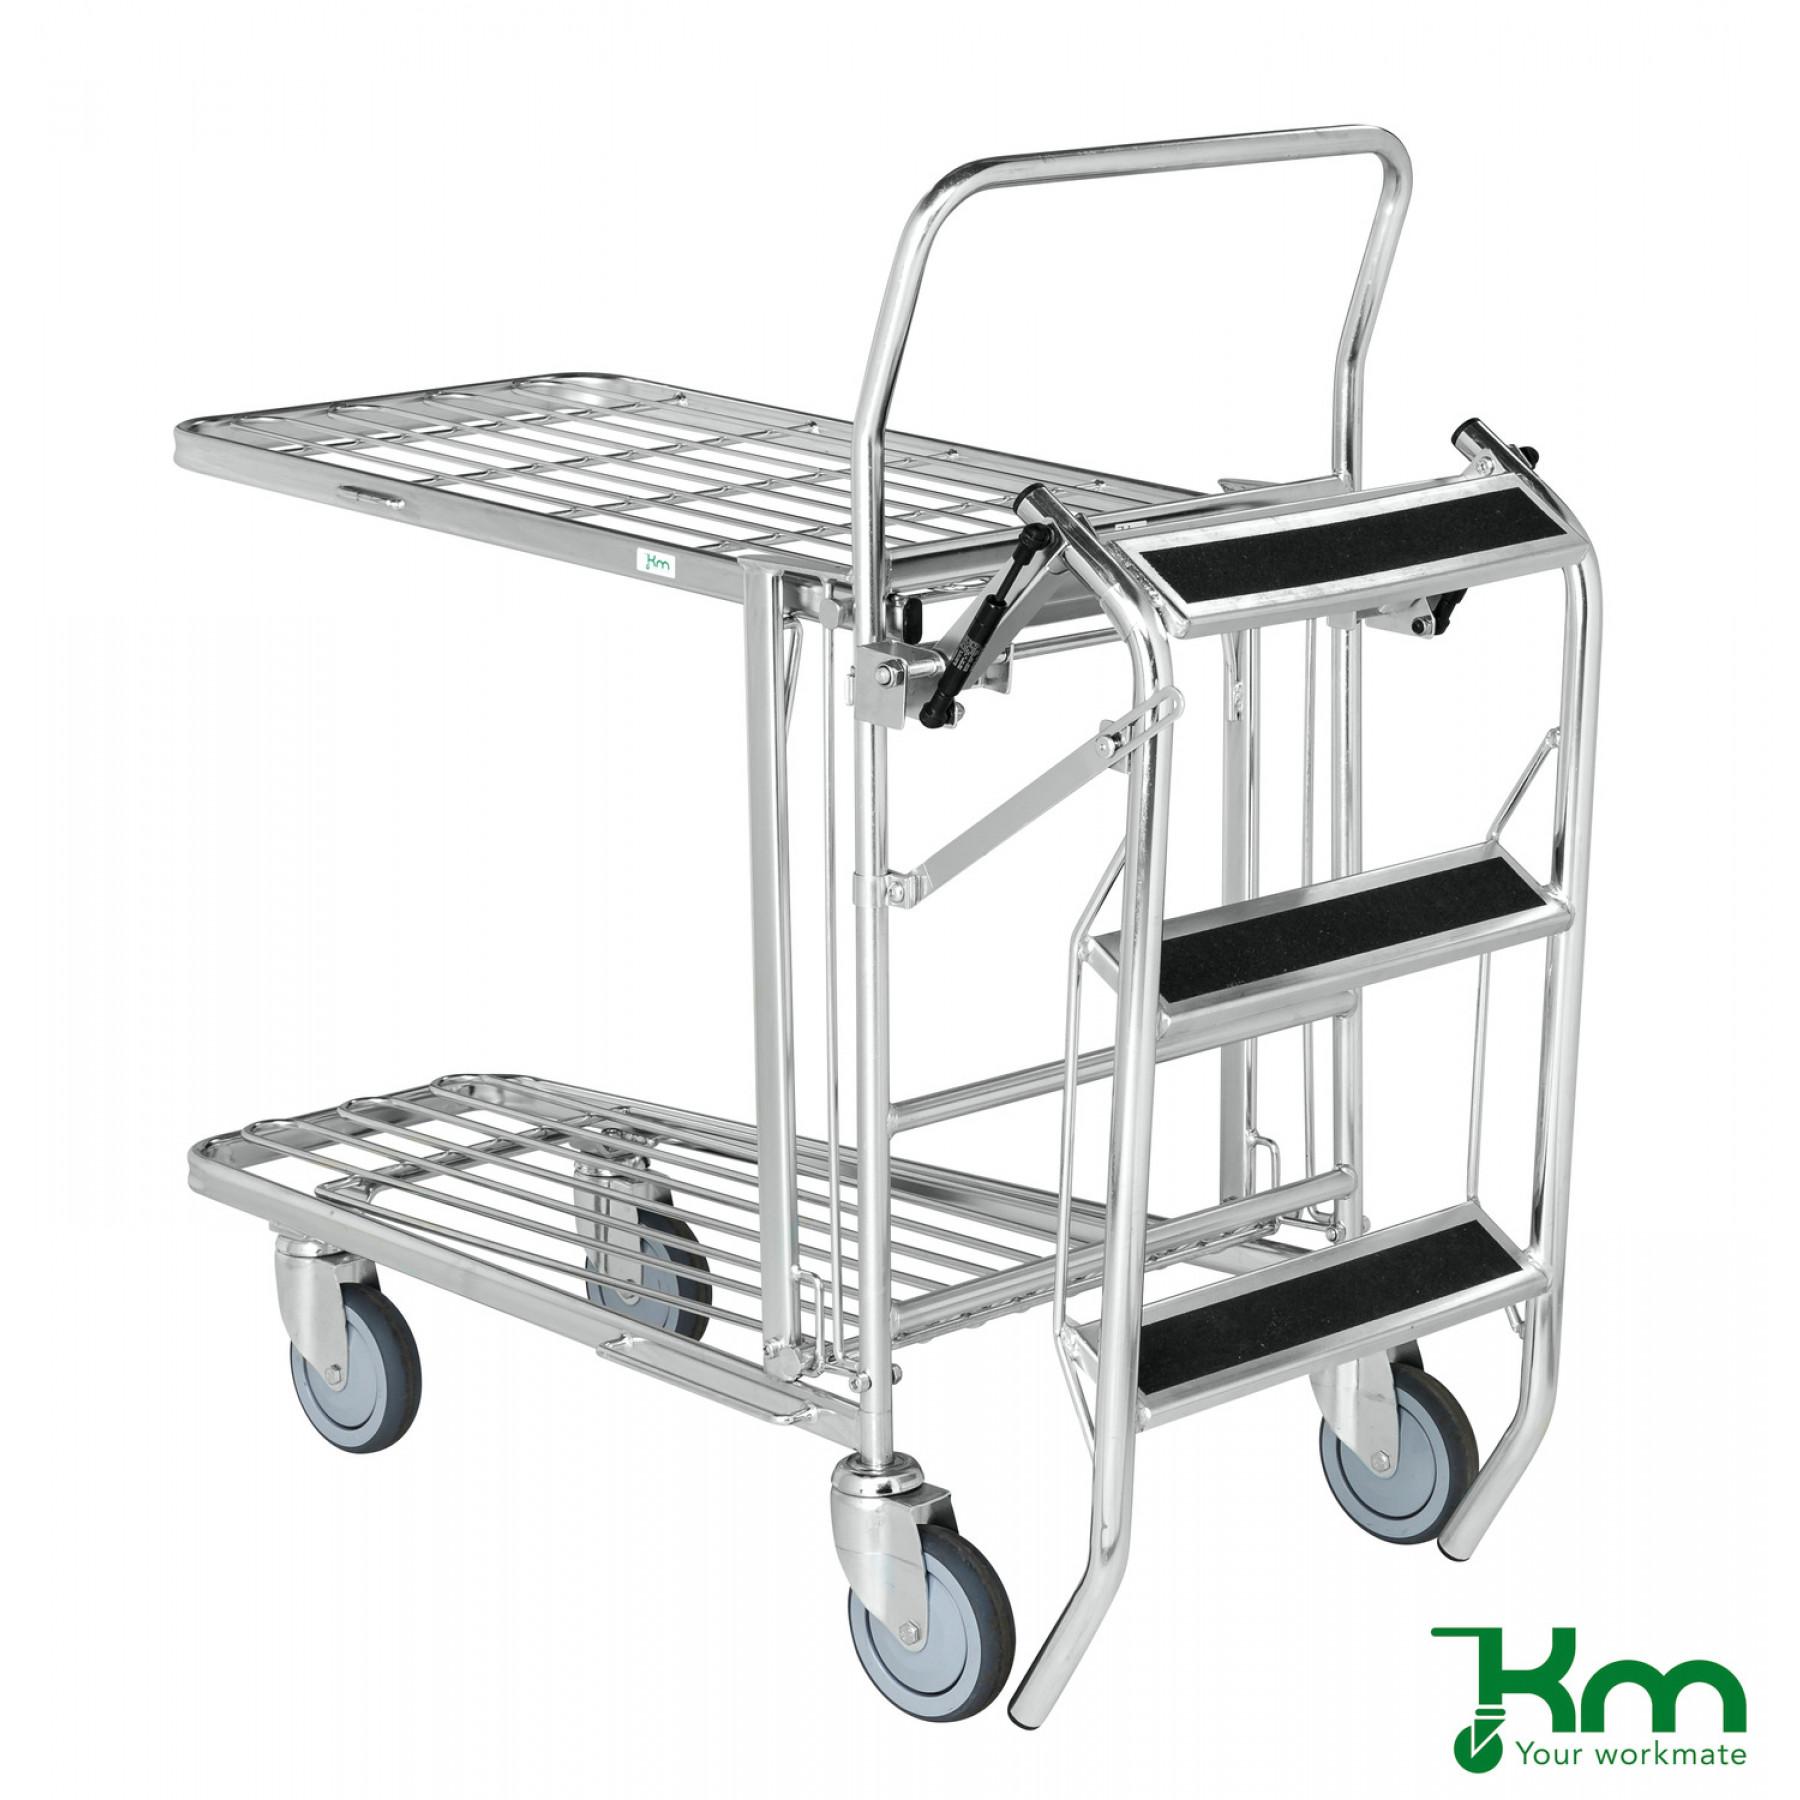 Verzinkte trap voor winkelwagens, KM 07401-4202